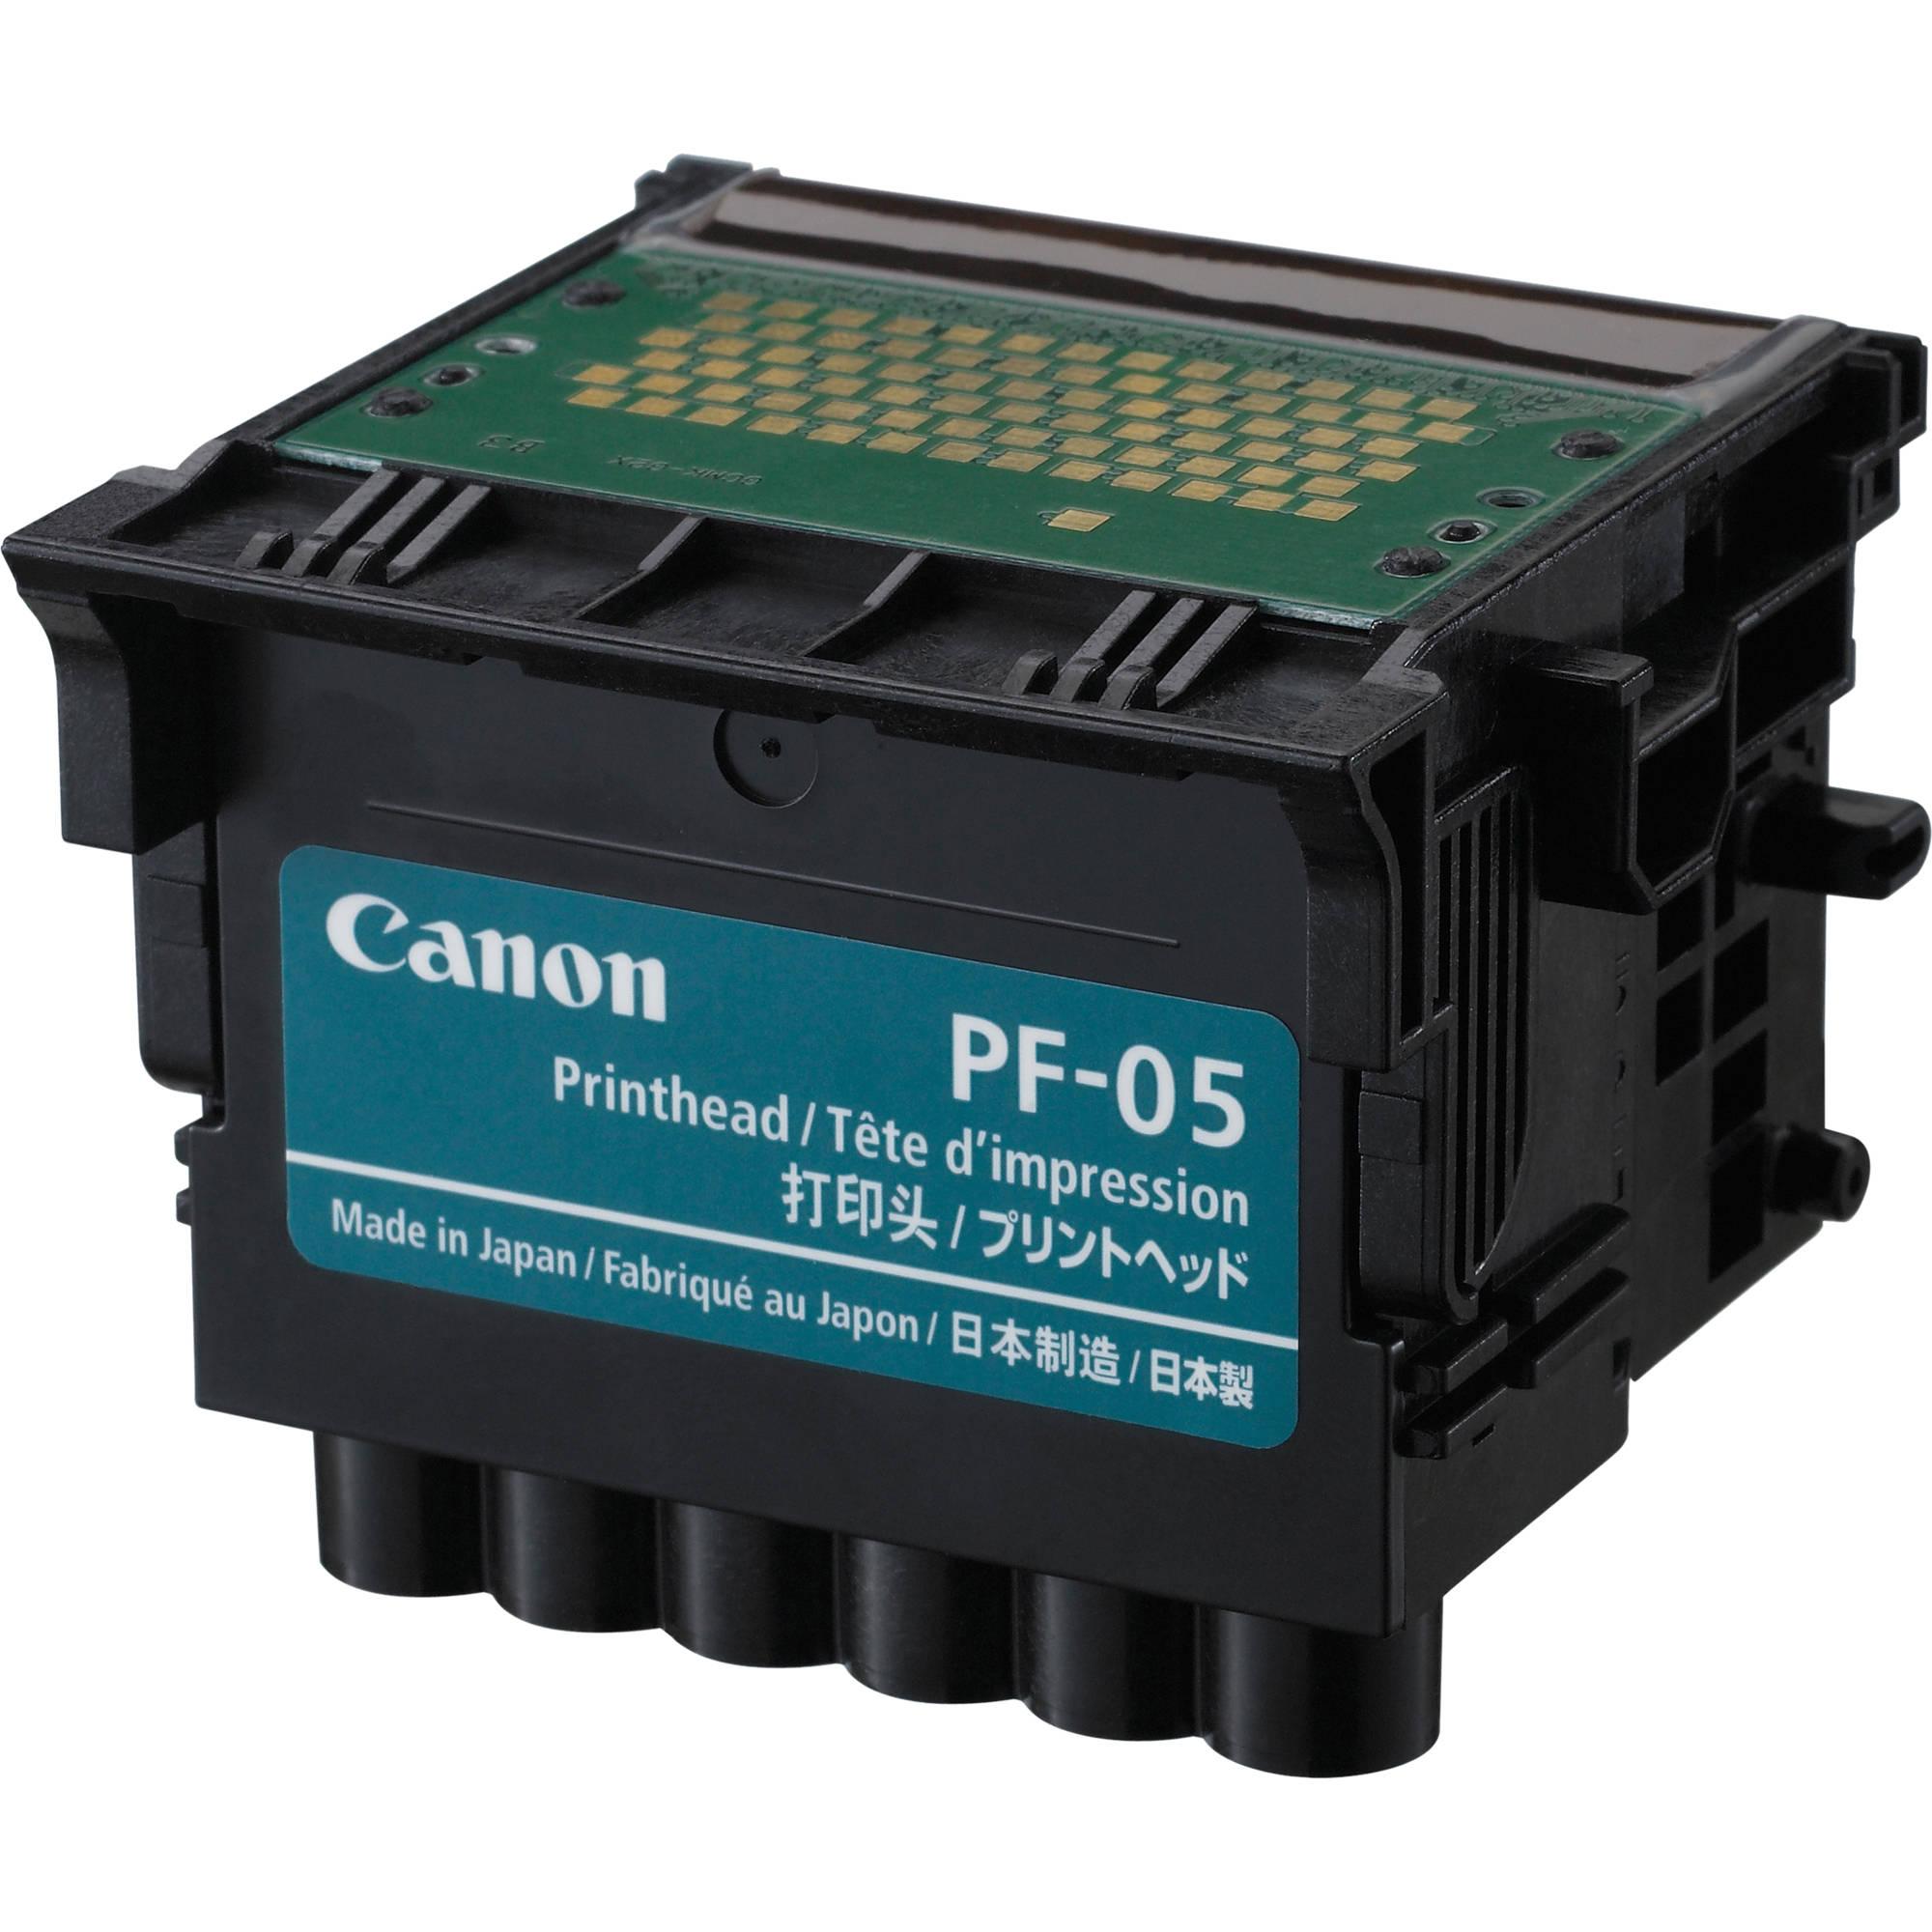 Canon PF05 print heads